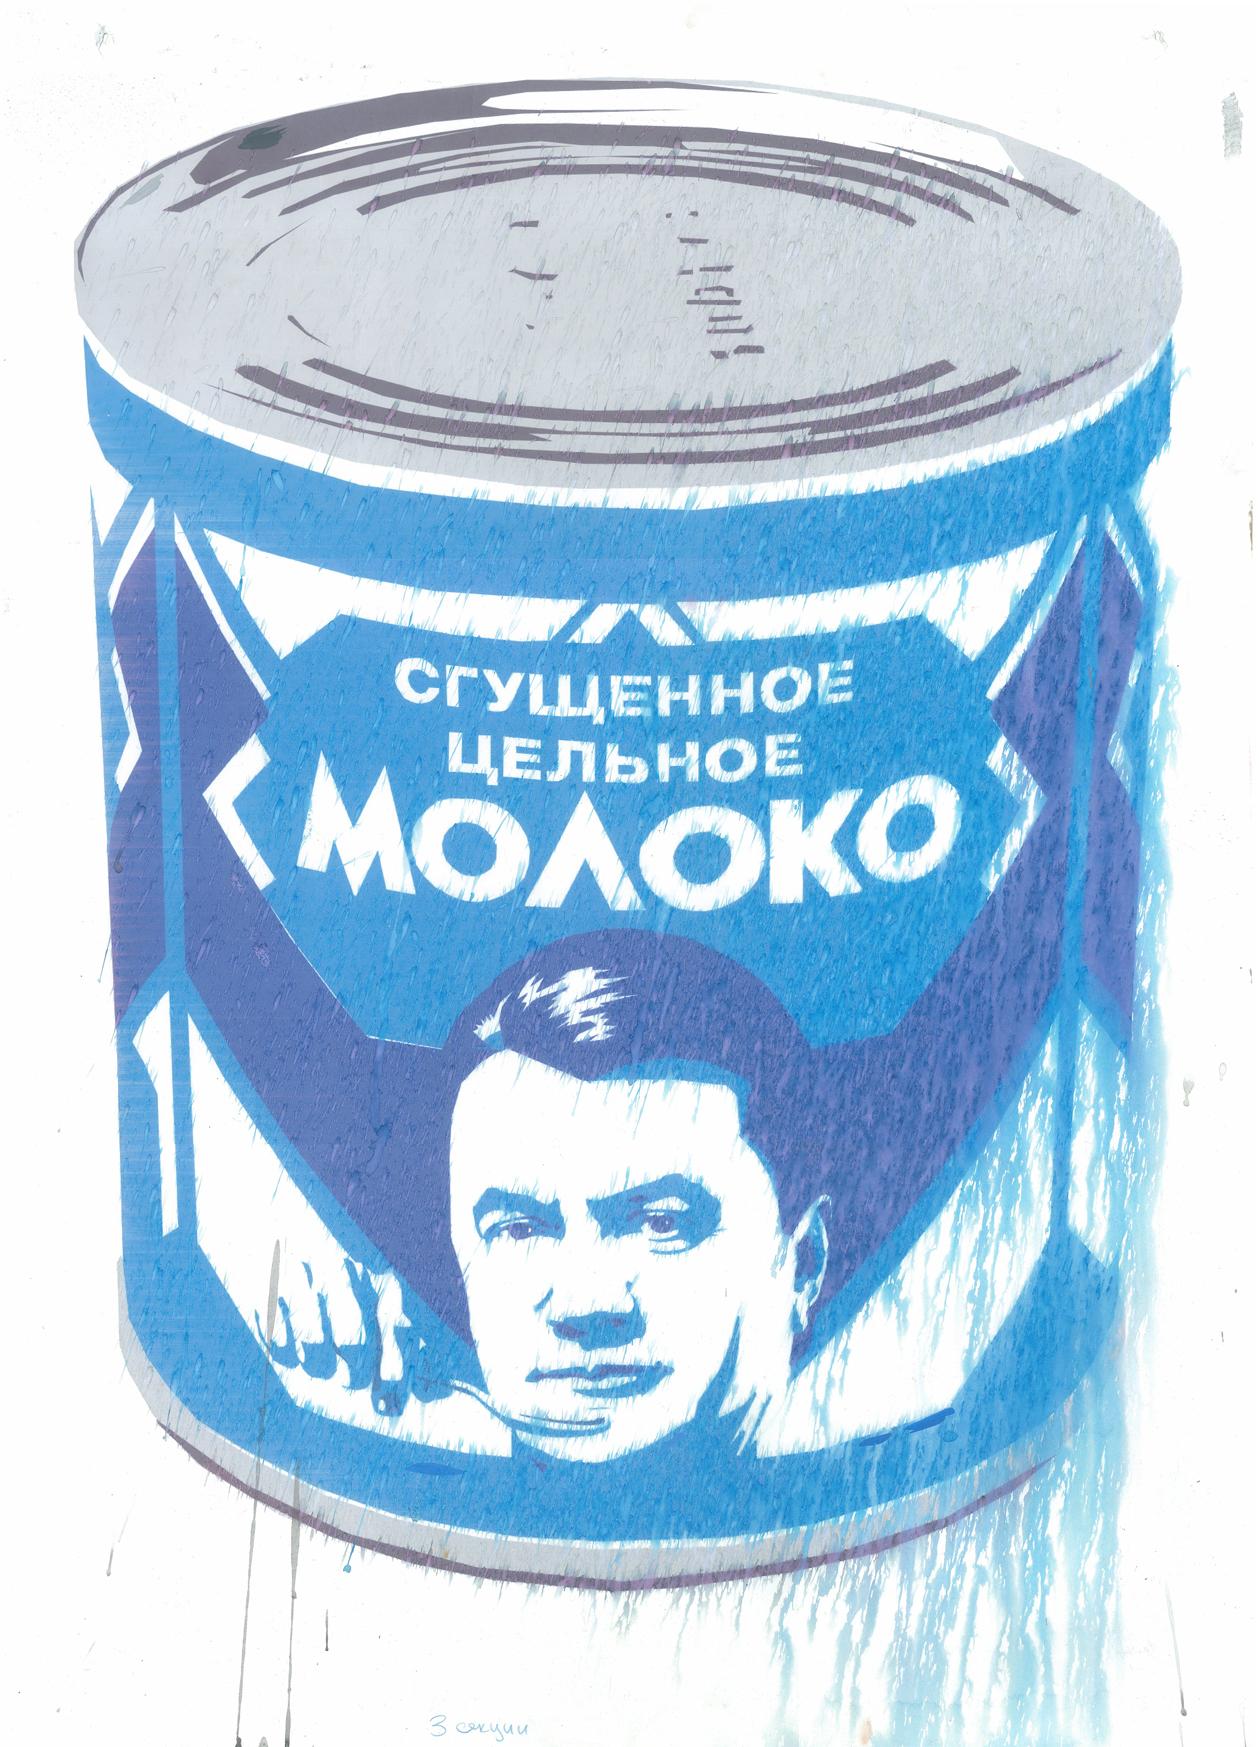 moloko. 80x60.paper, printing. 2010